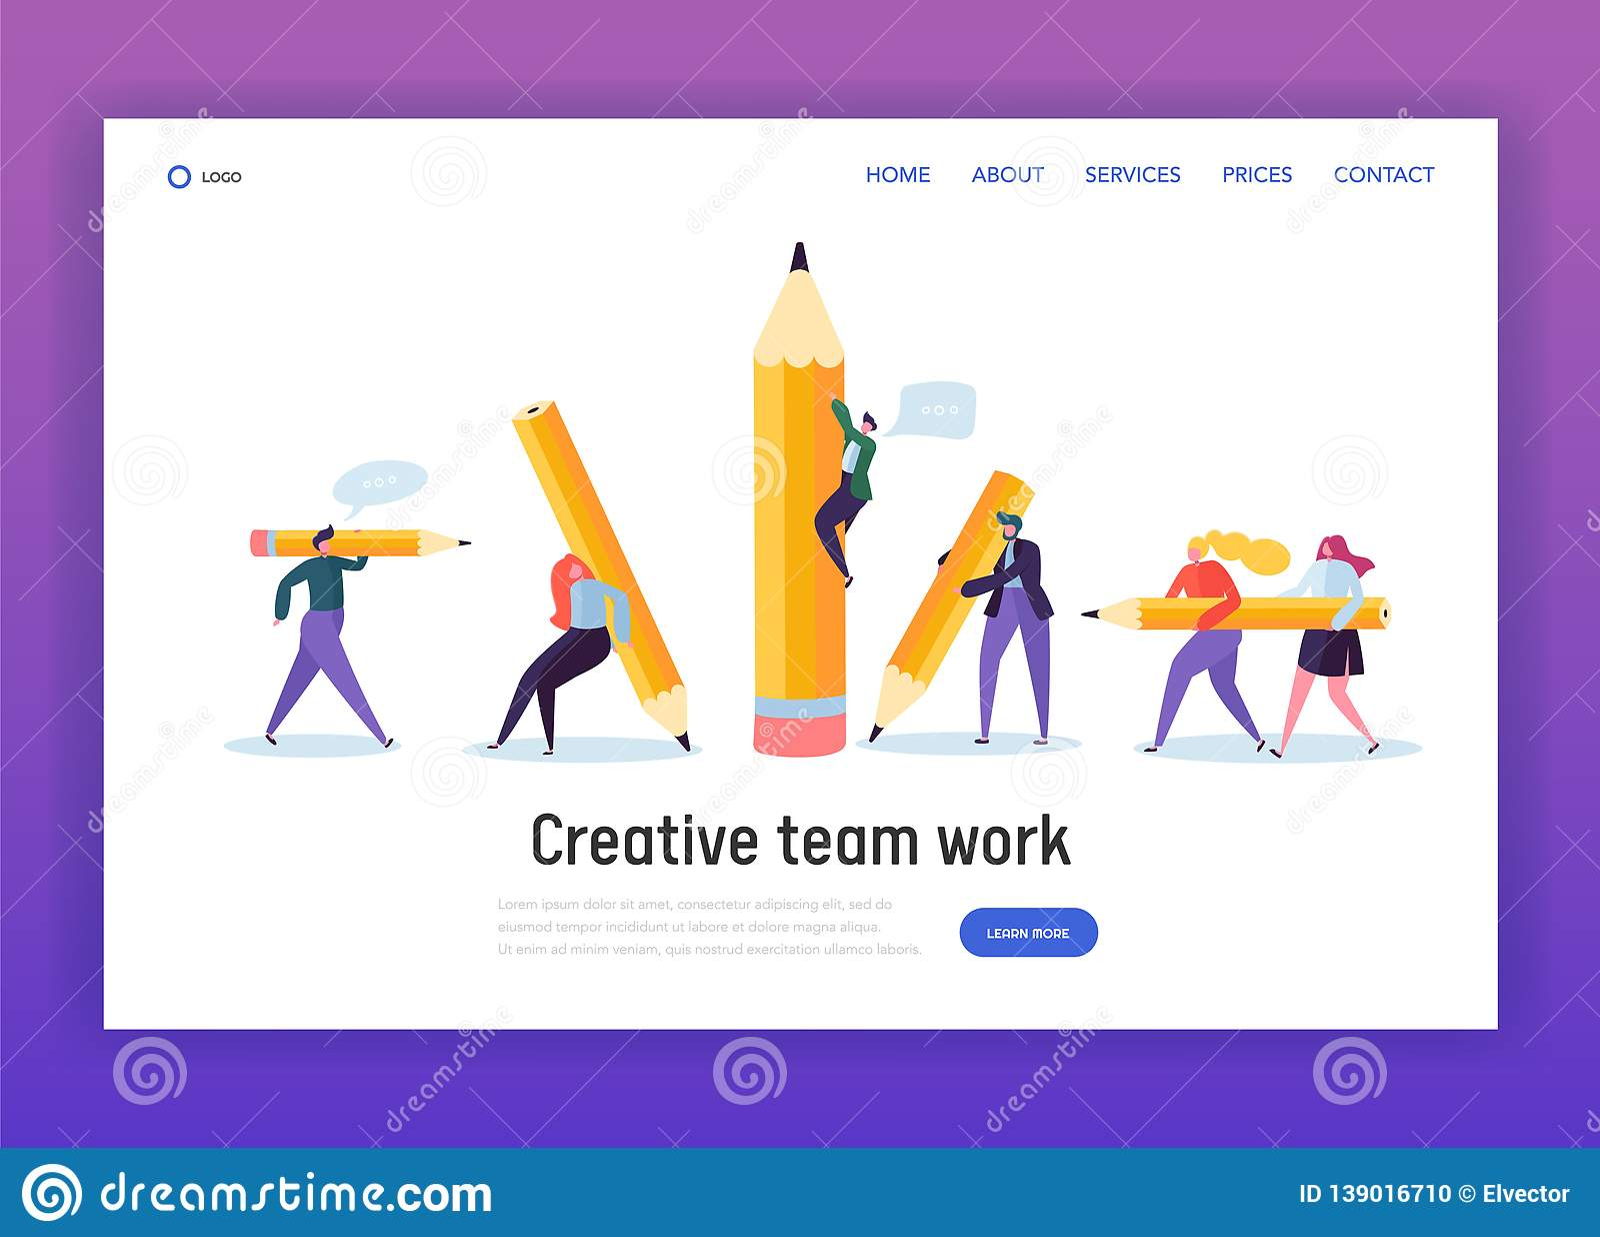 Business Creative Copywriter Teamwork Landing Page. Drawn People Holding Pencil. Blogger Work Goal. Education Job Leader